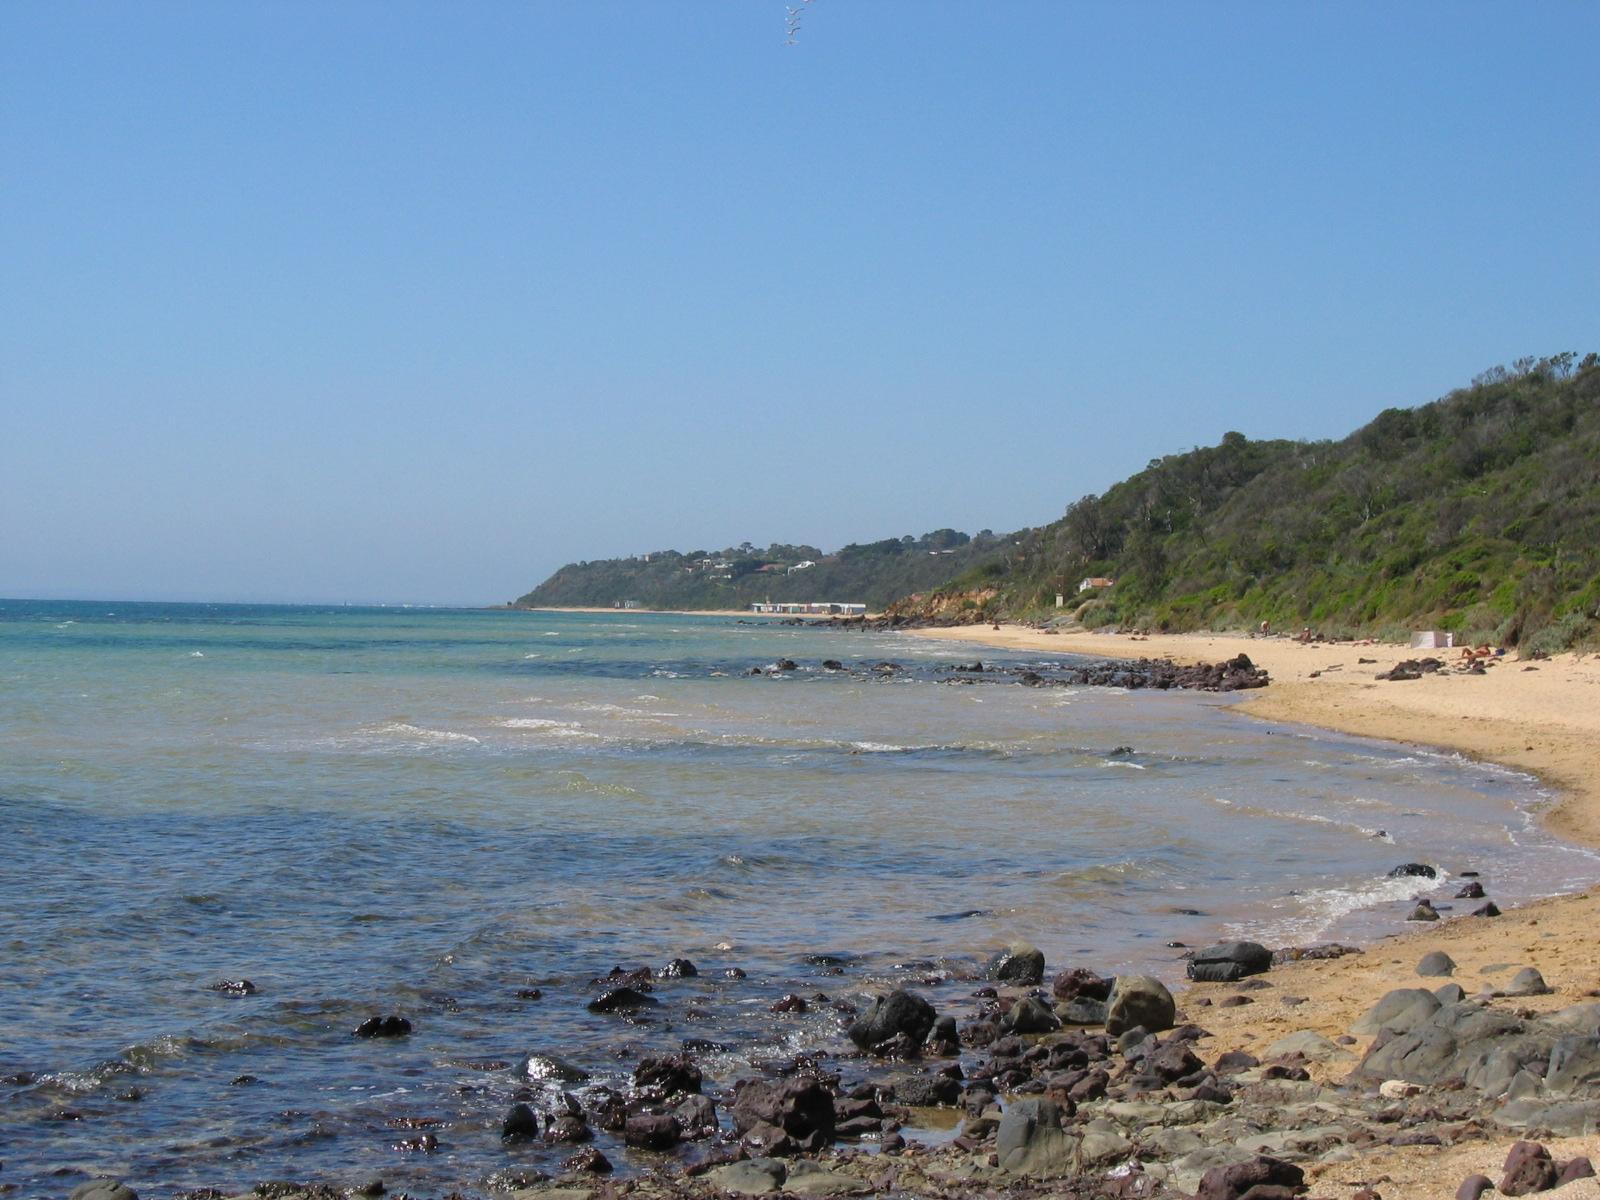 Sunnyside Beach Map - Victoria, Australia - Mapcarta